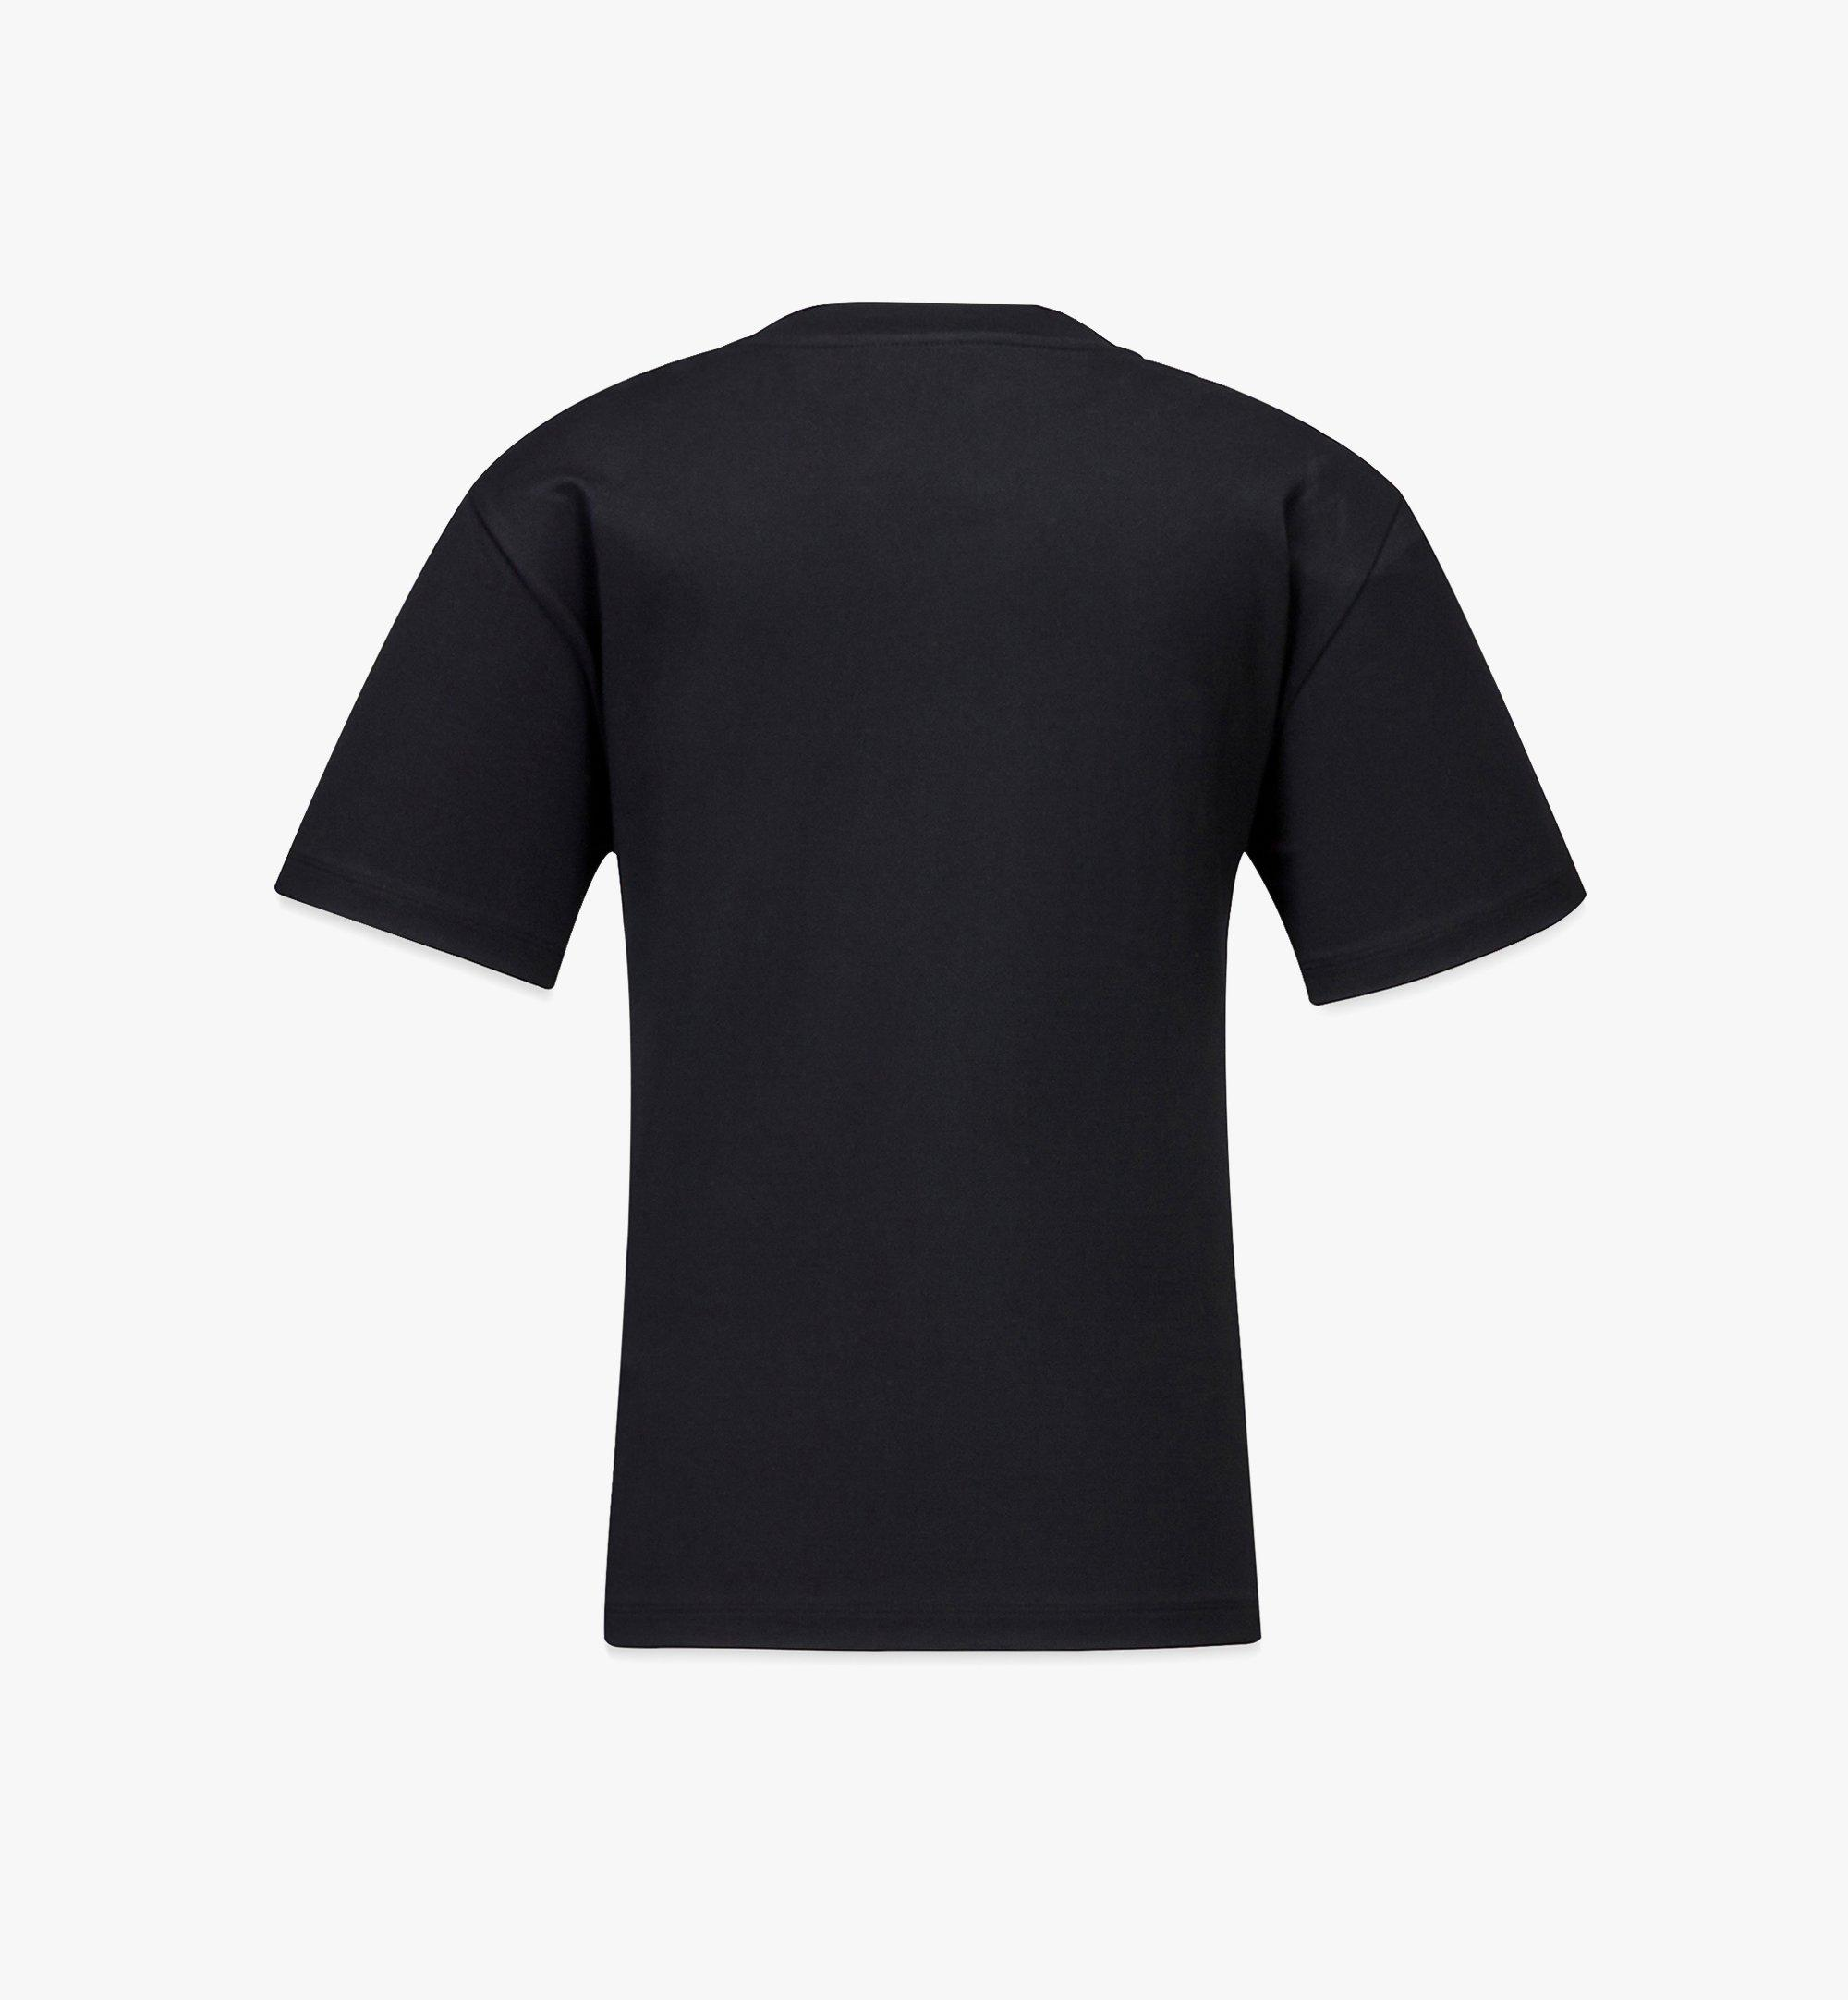 MCM 女士 Geo 塗鴉 T 恤 Black MFTBSMM07B200M 更多視圖 1